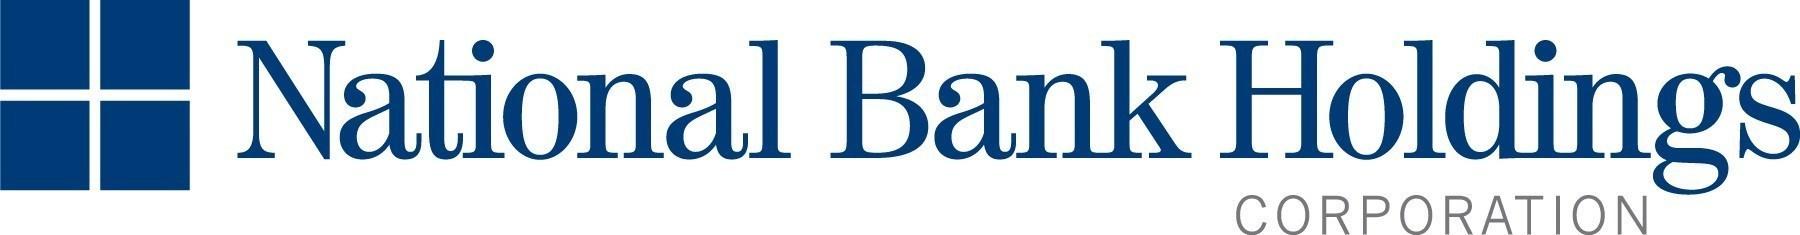 National Bank Holdings logo